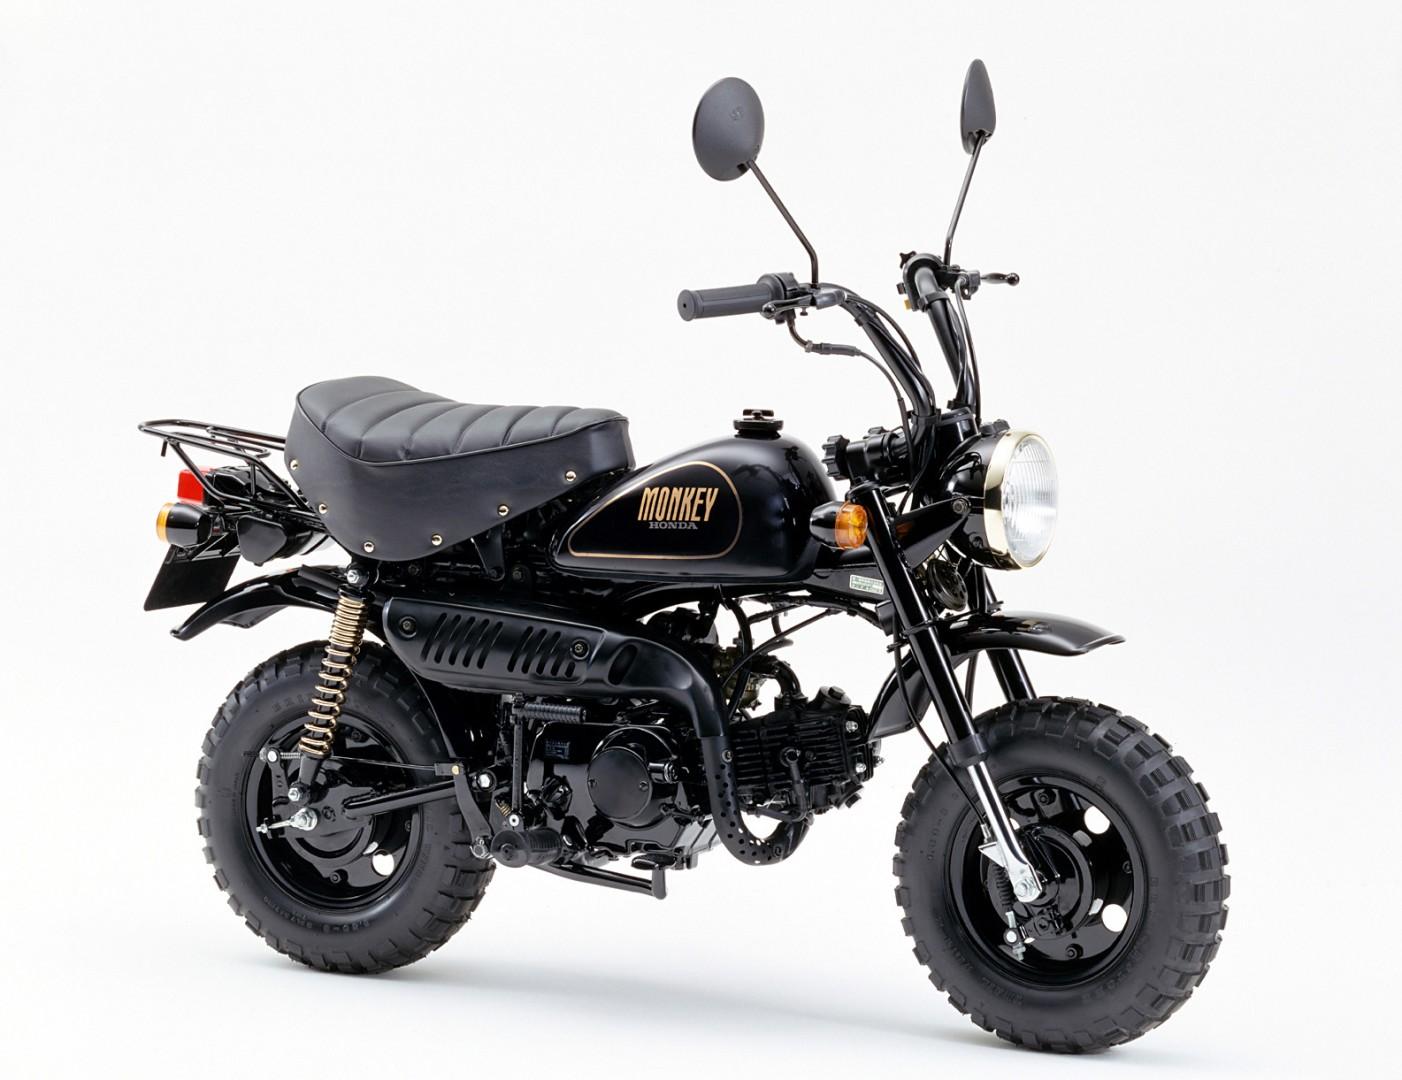 Moto del día: Honda Z50 Monkey